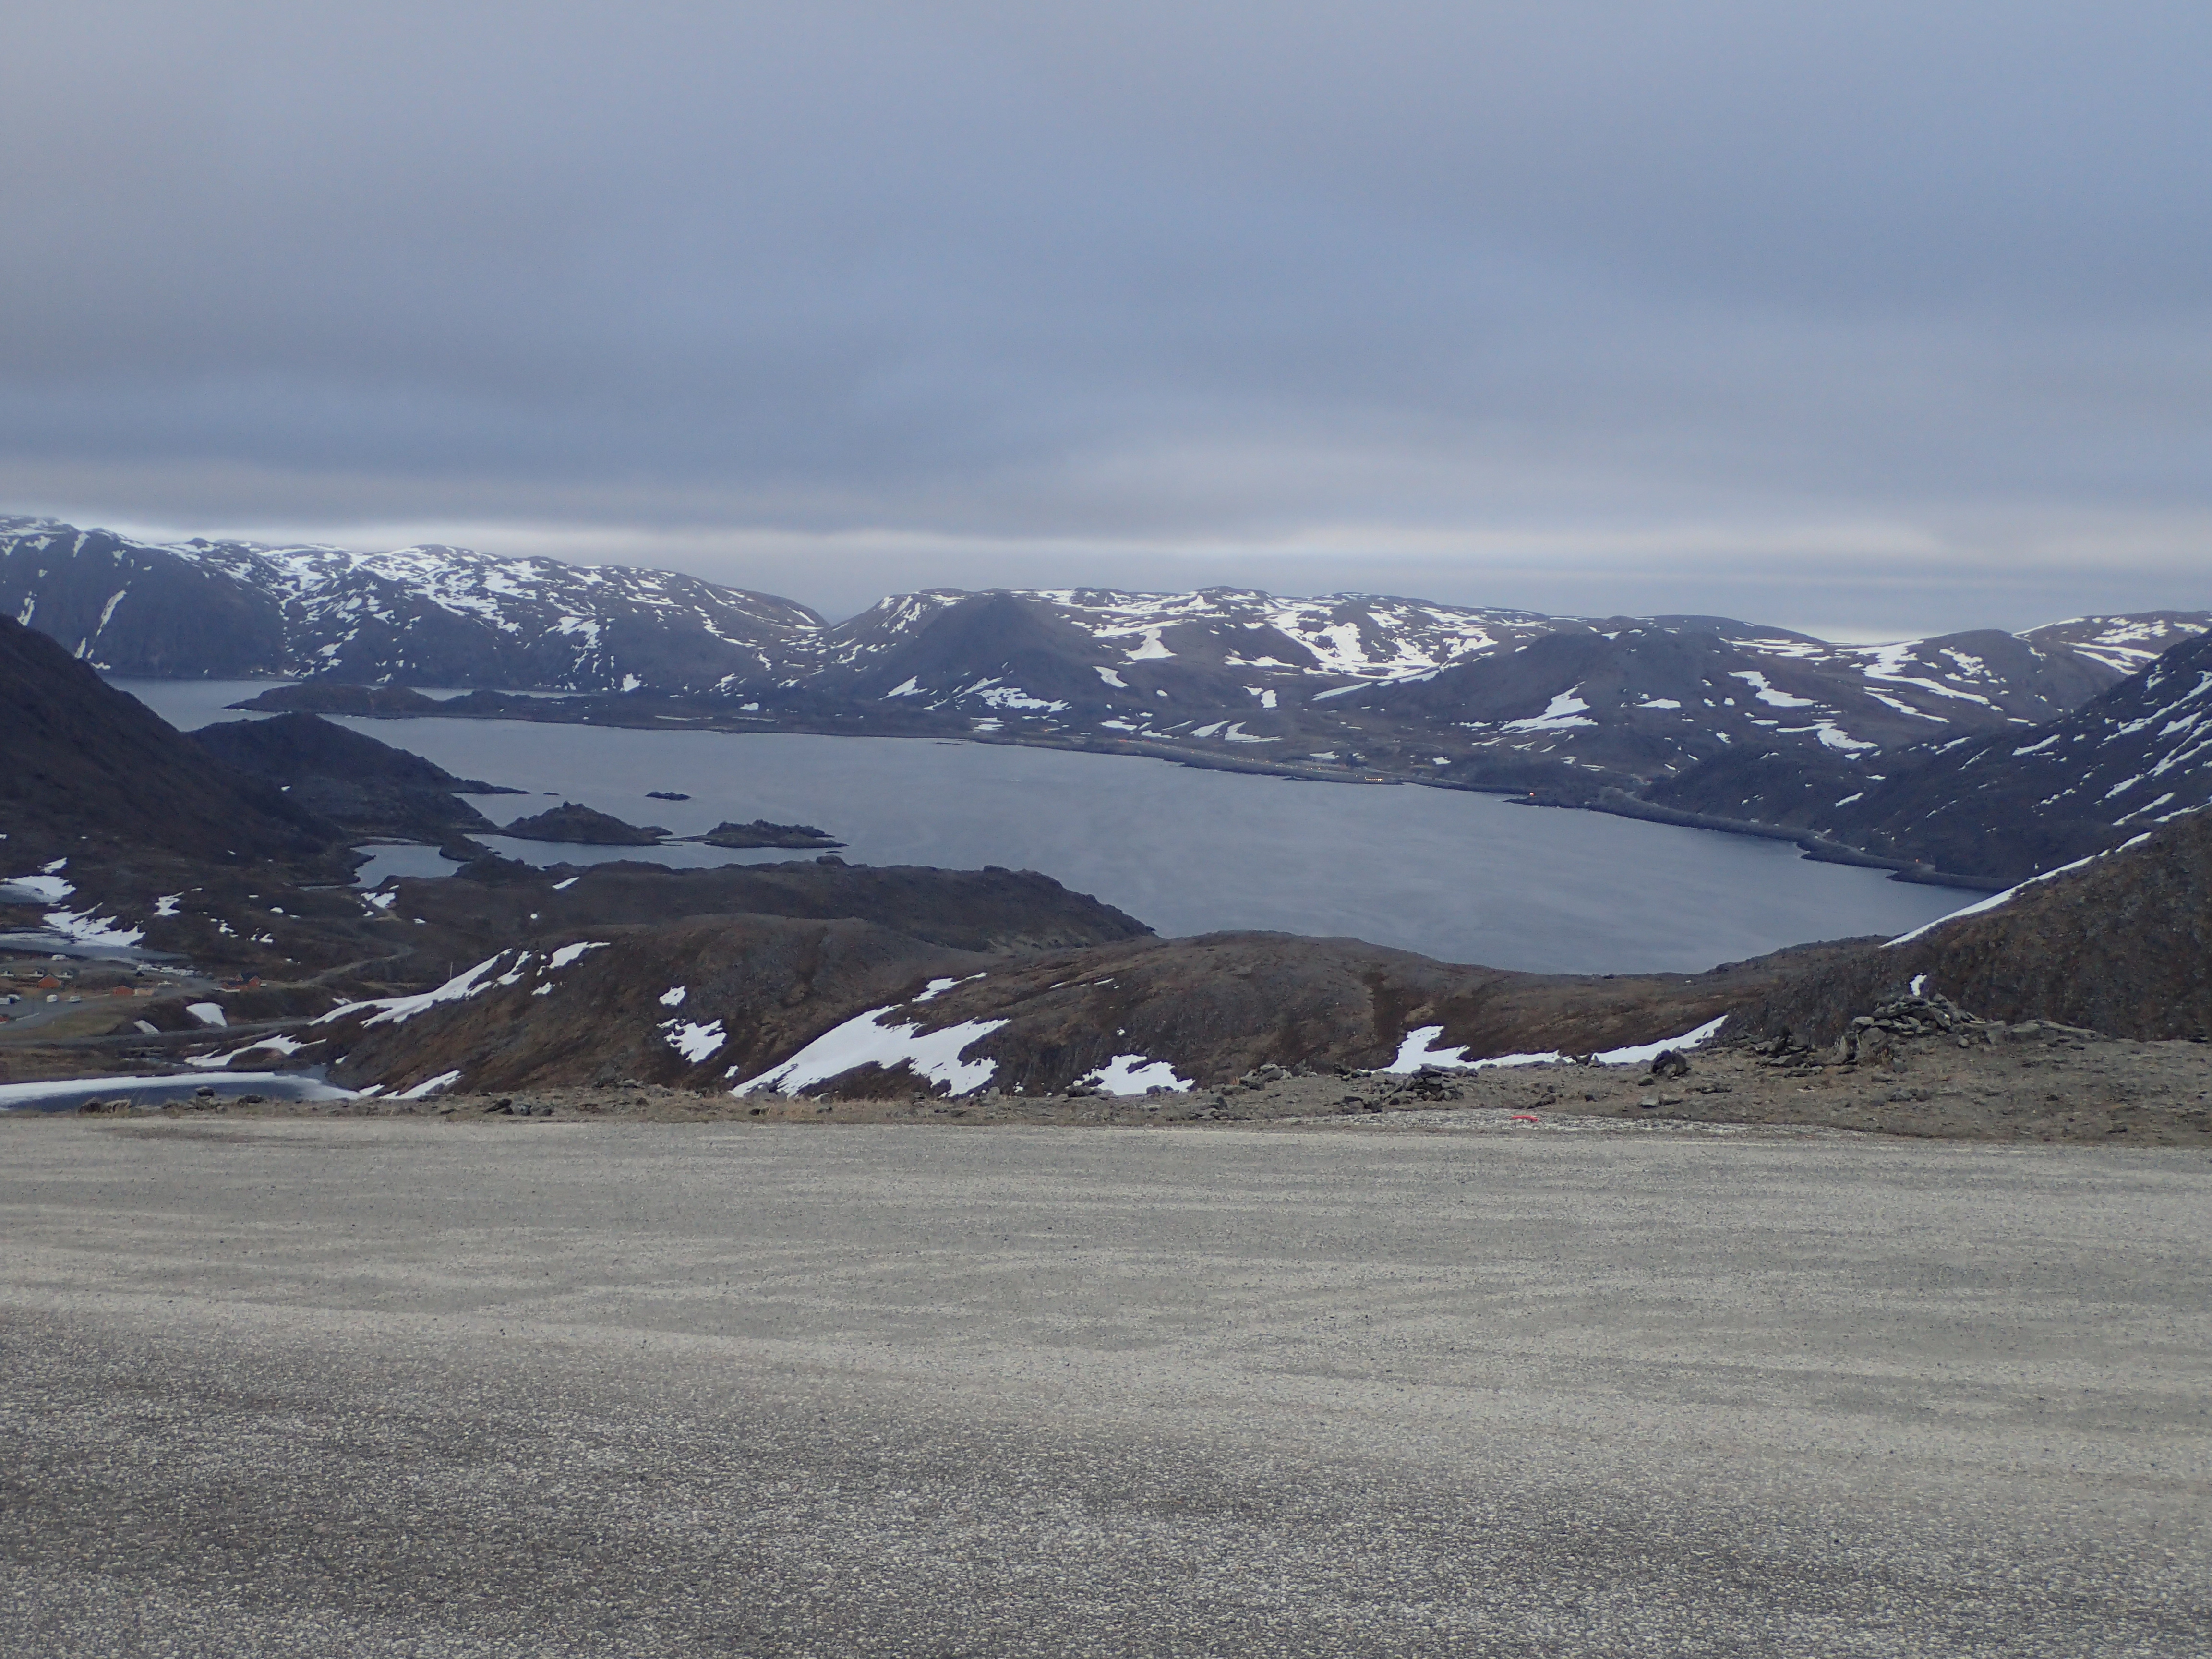 die schneebedeckten Berge und Fjorde um Honningsvåg